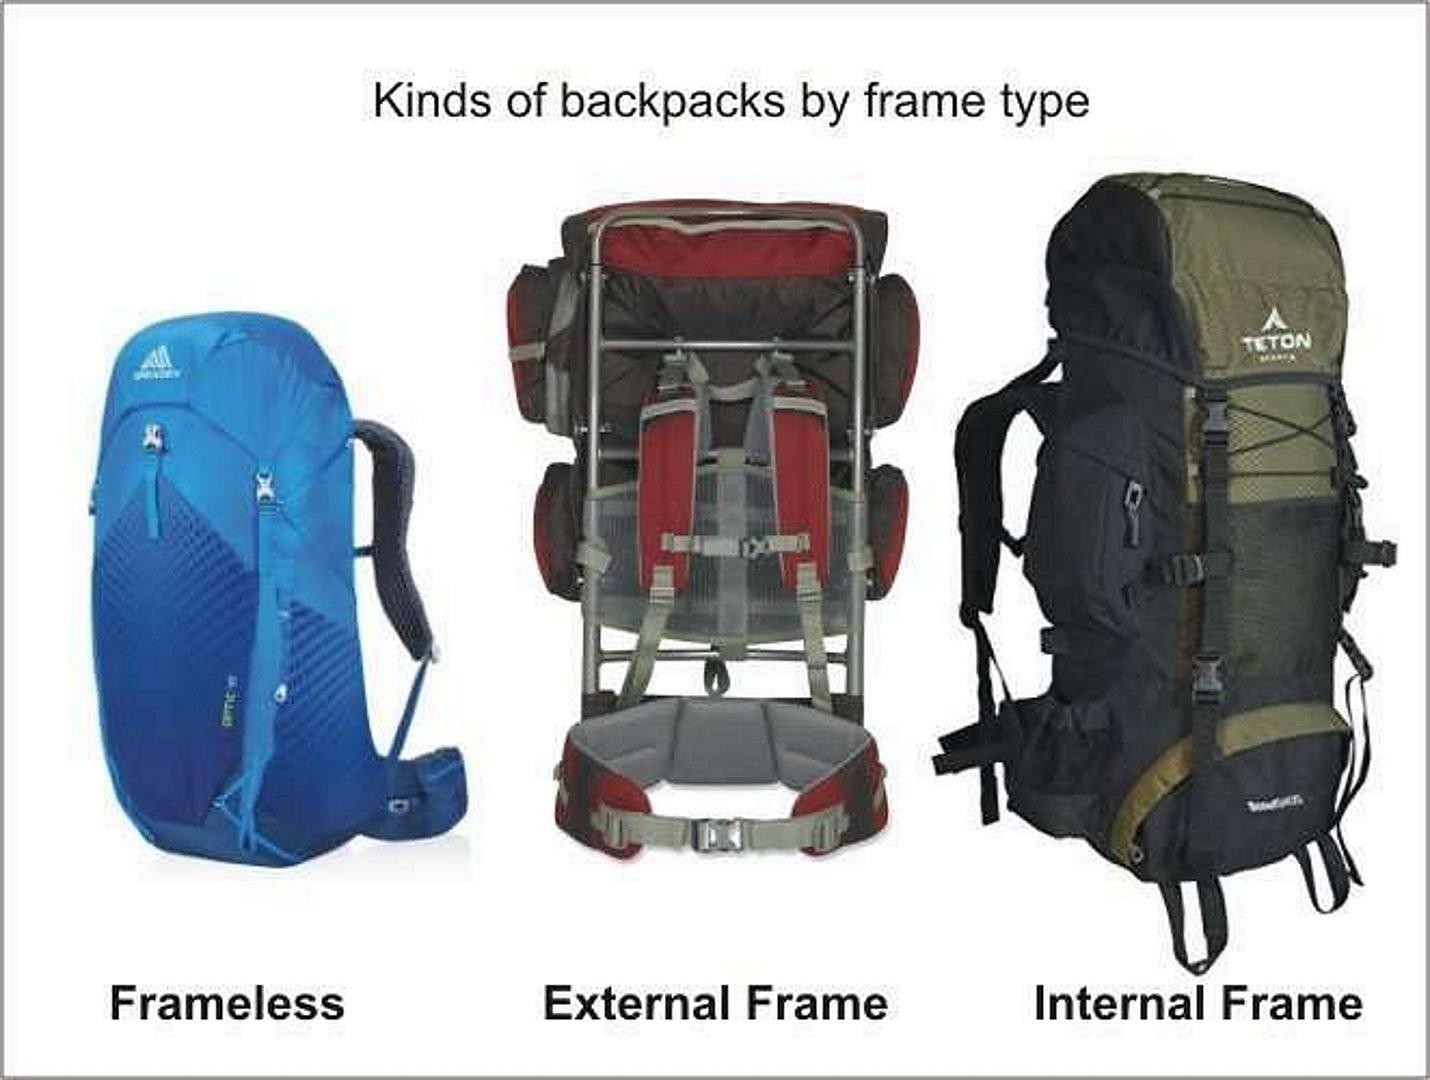 King Backpacks